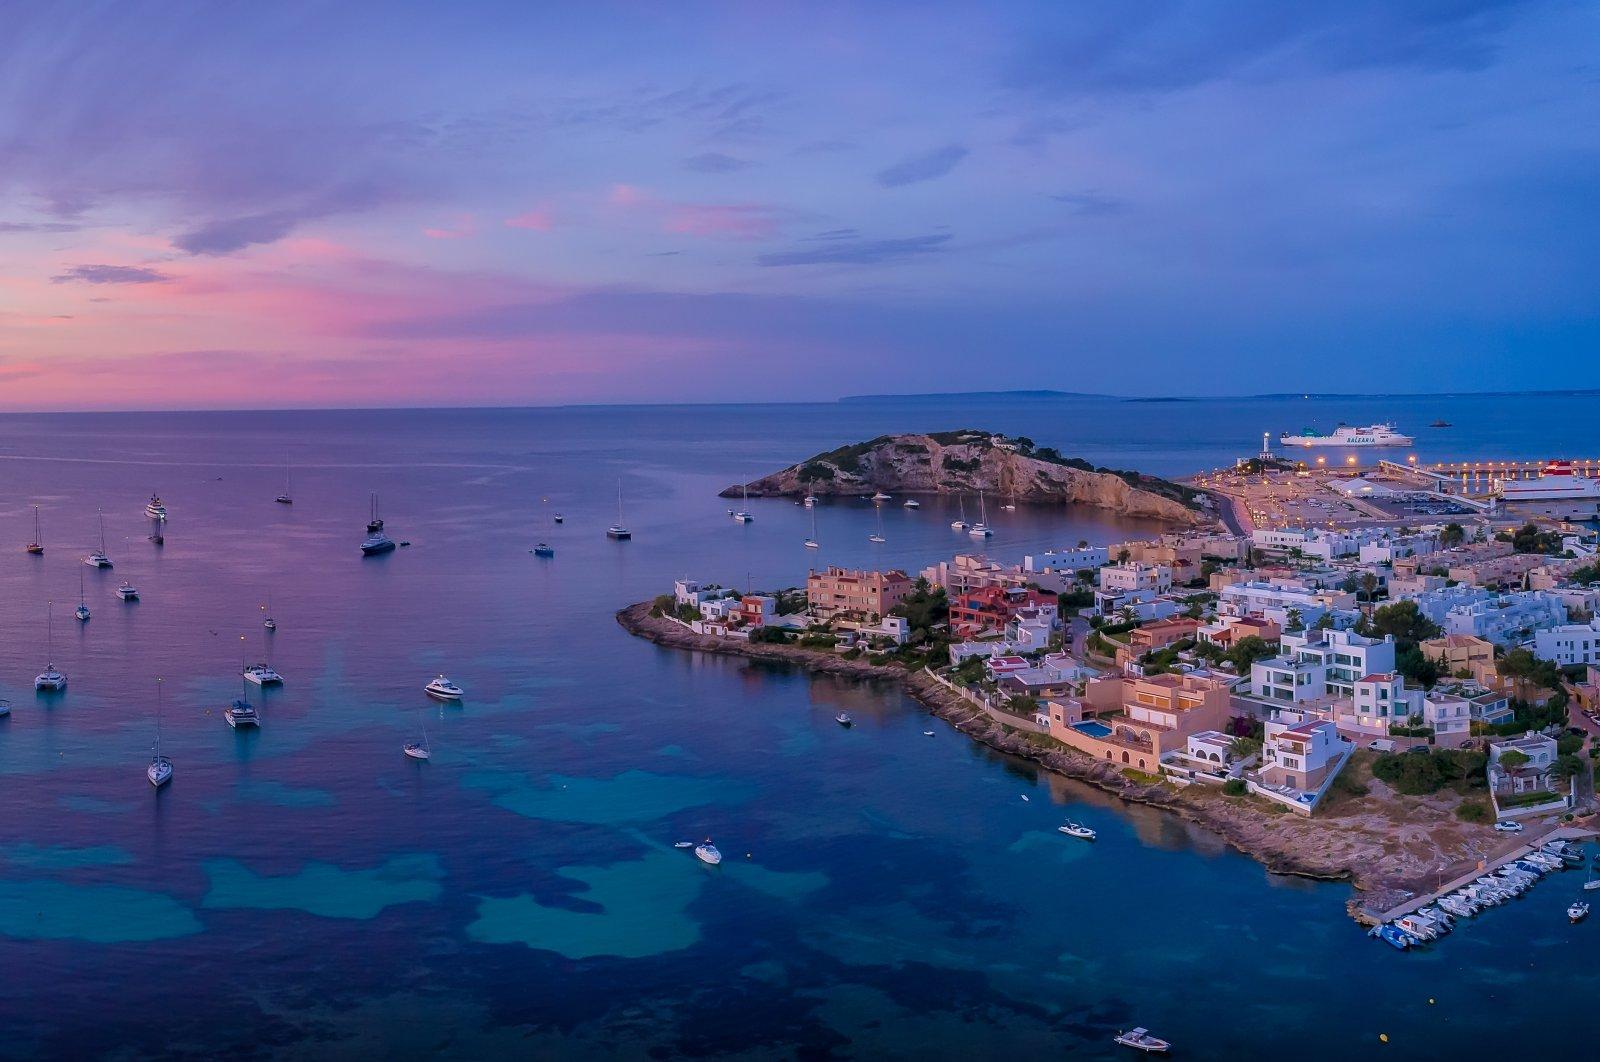 General view of Ibiza Island. (Shutterstock Photo)